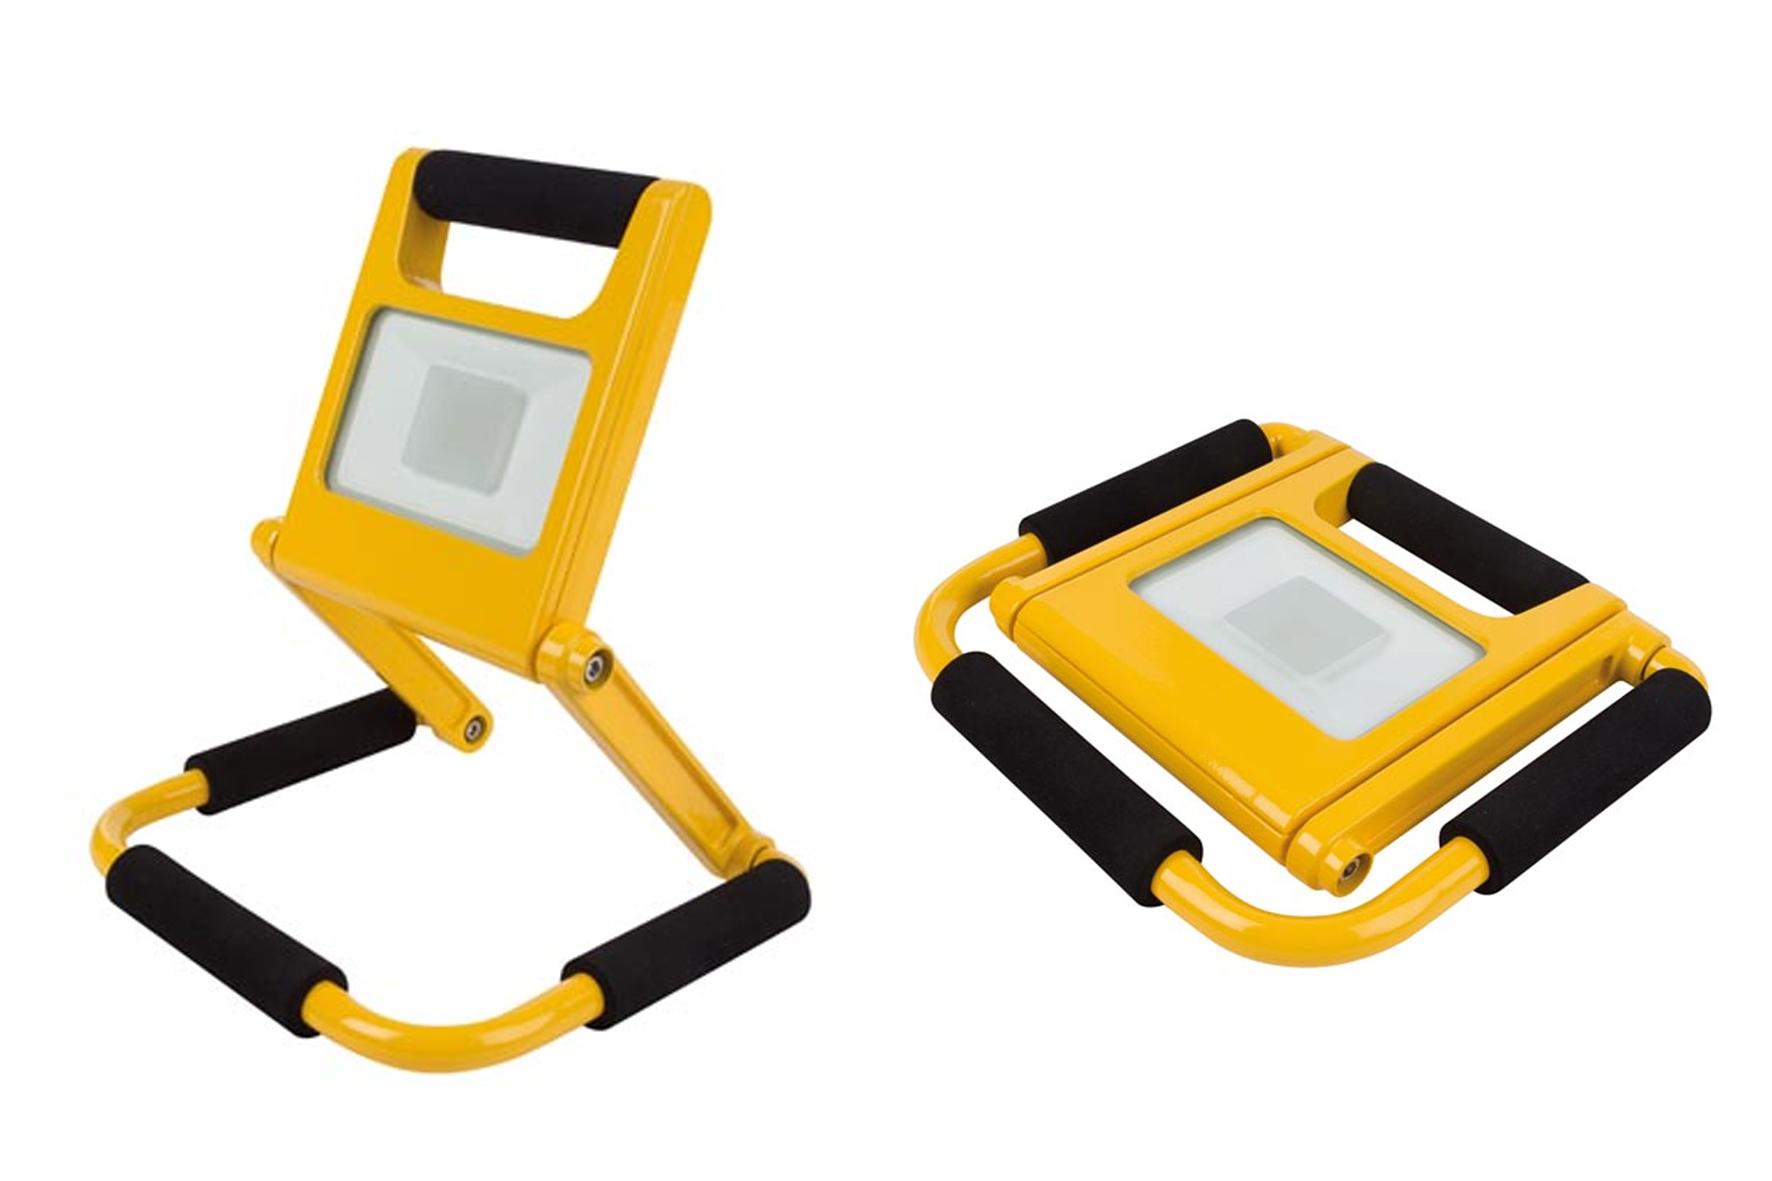 Rechargeable Led Lampe Chantier 10w De Perel Portatif Ultra Plat tQrhsd